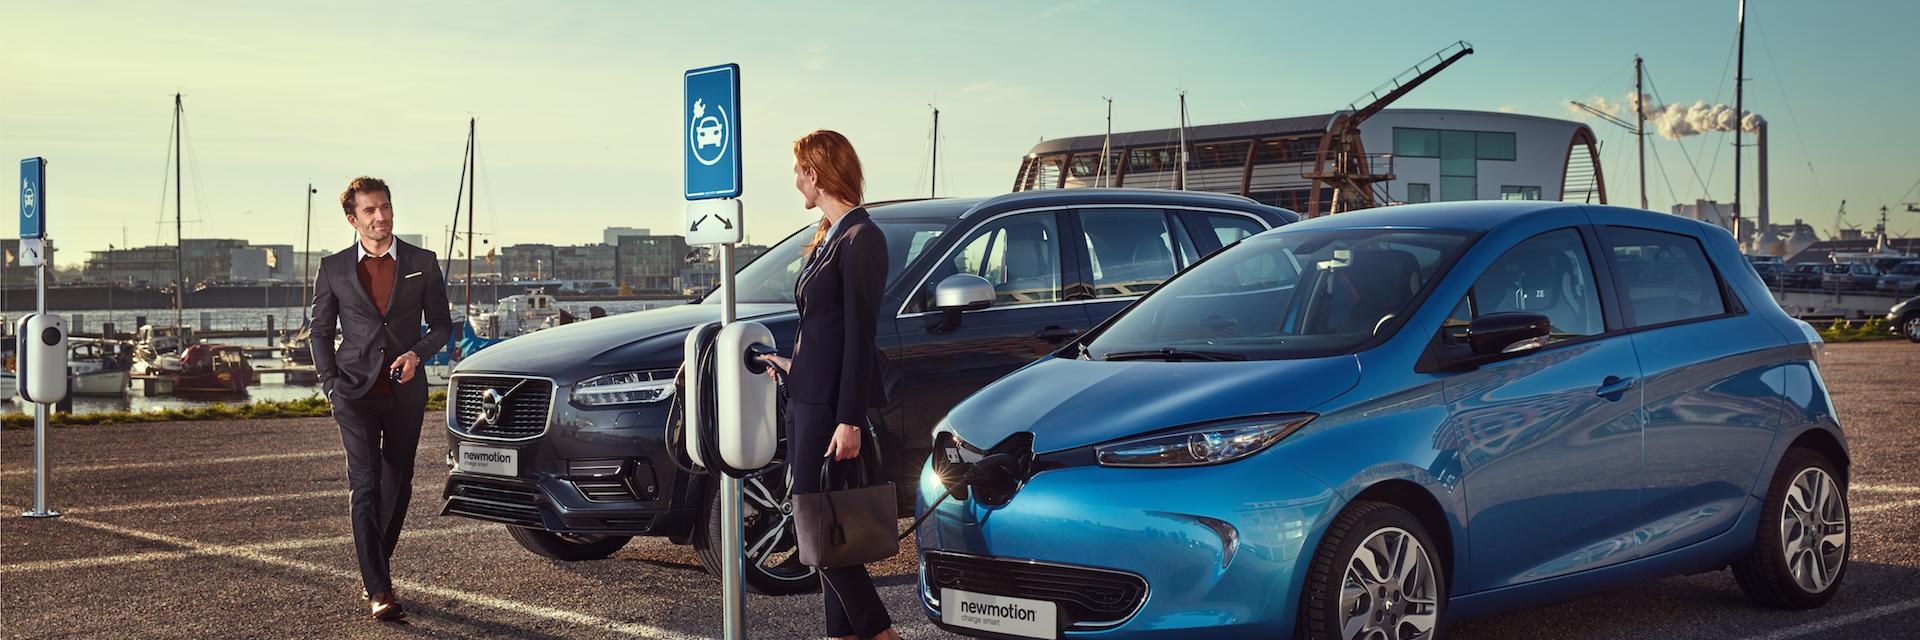 Oplaadpunten Voor Elektrische Auto S Newmotion Nl Newmotion